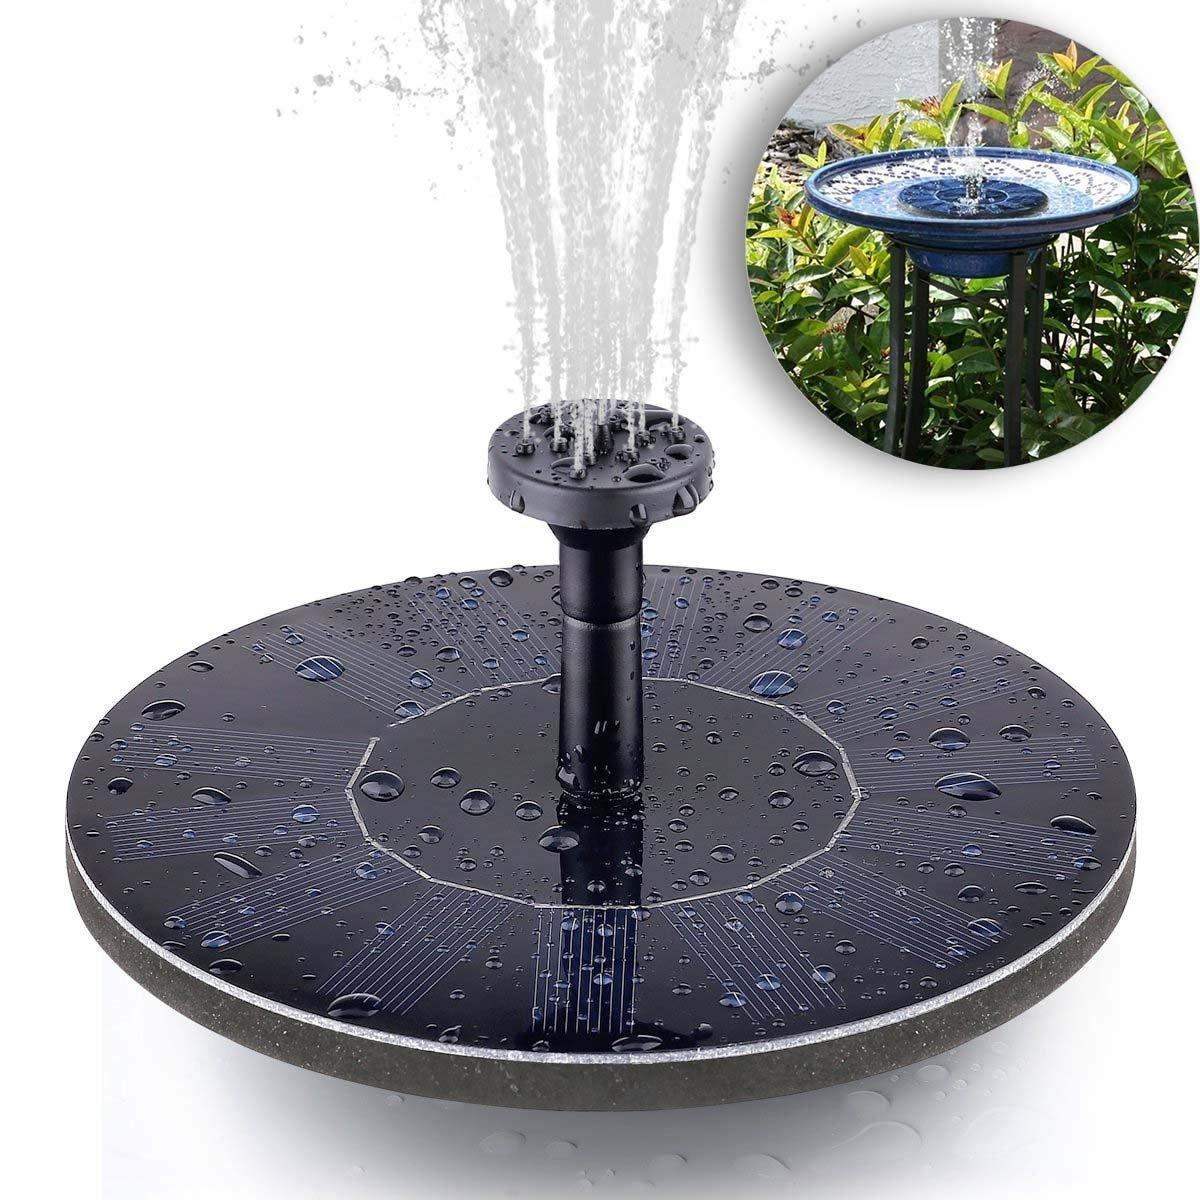 LEDemain Solar Power Fountain Pump Kit Perfect for Bird Bath, Birdbath Pond Pool Fish Tank, Garden Decoration - 1.4W (Birdbath & Stand Not Included)